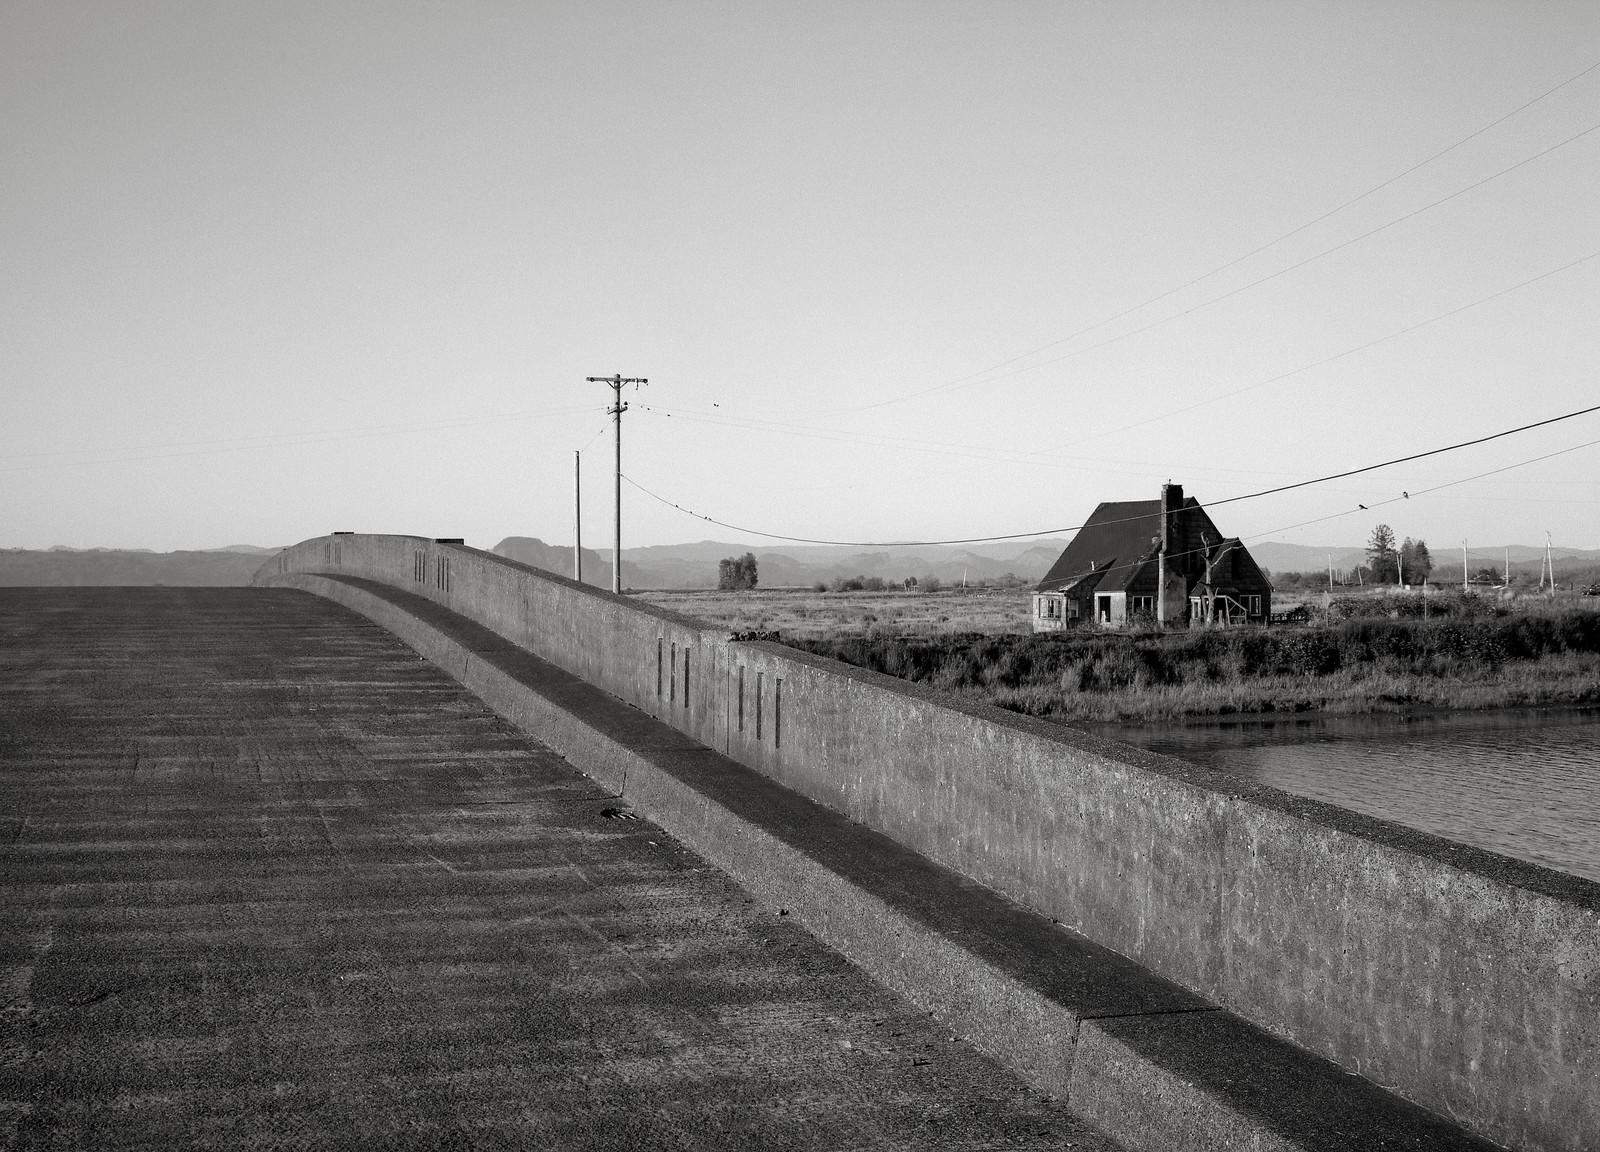 Svensen Island, Oregon | by austin granger